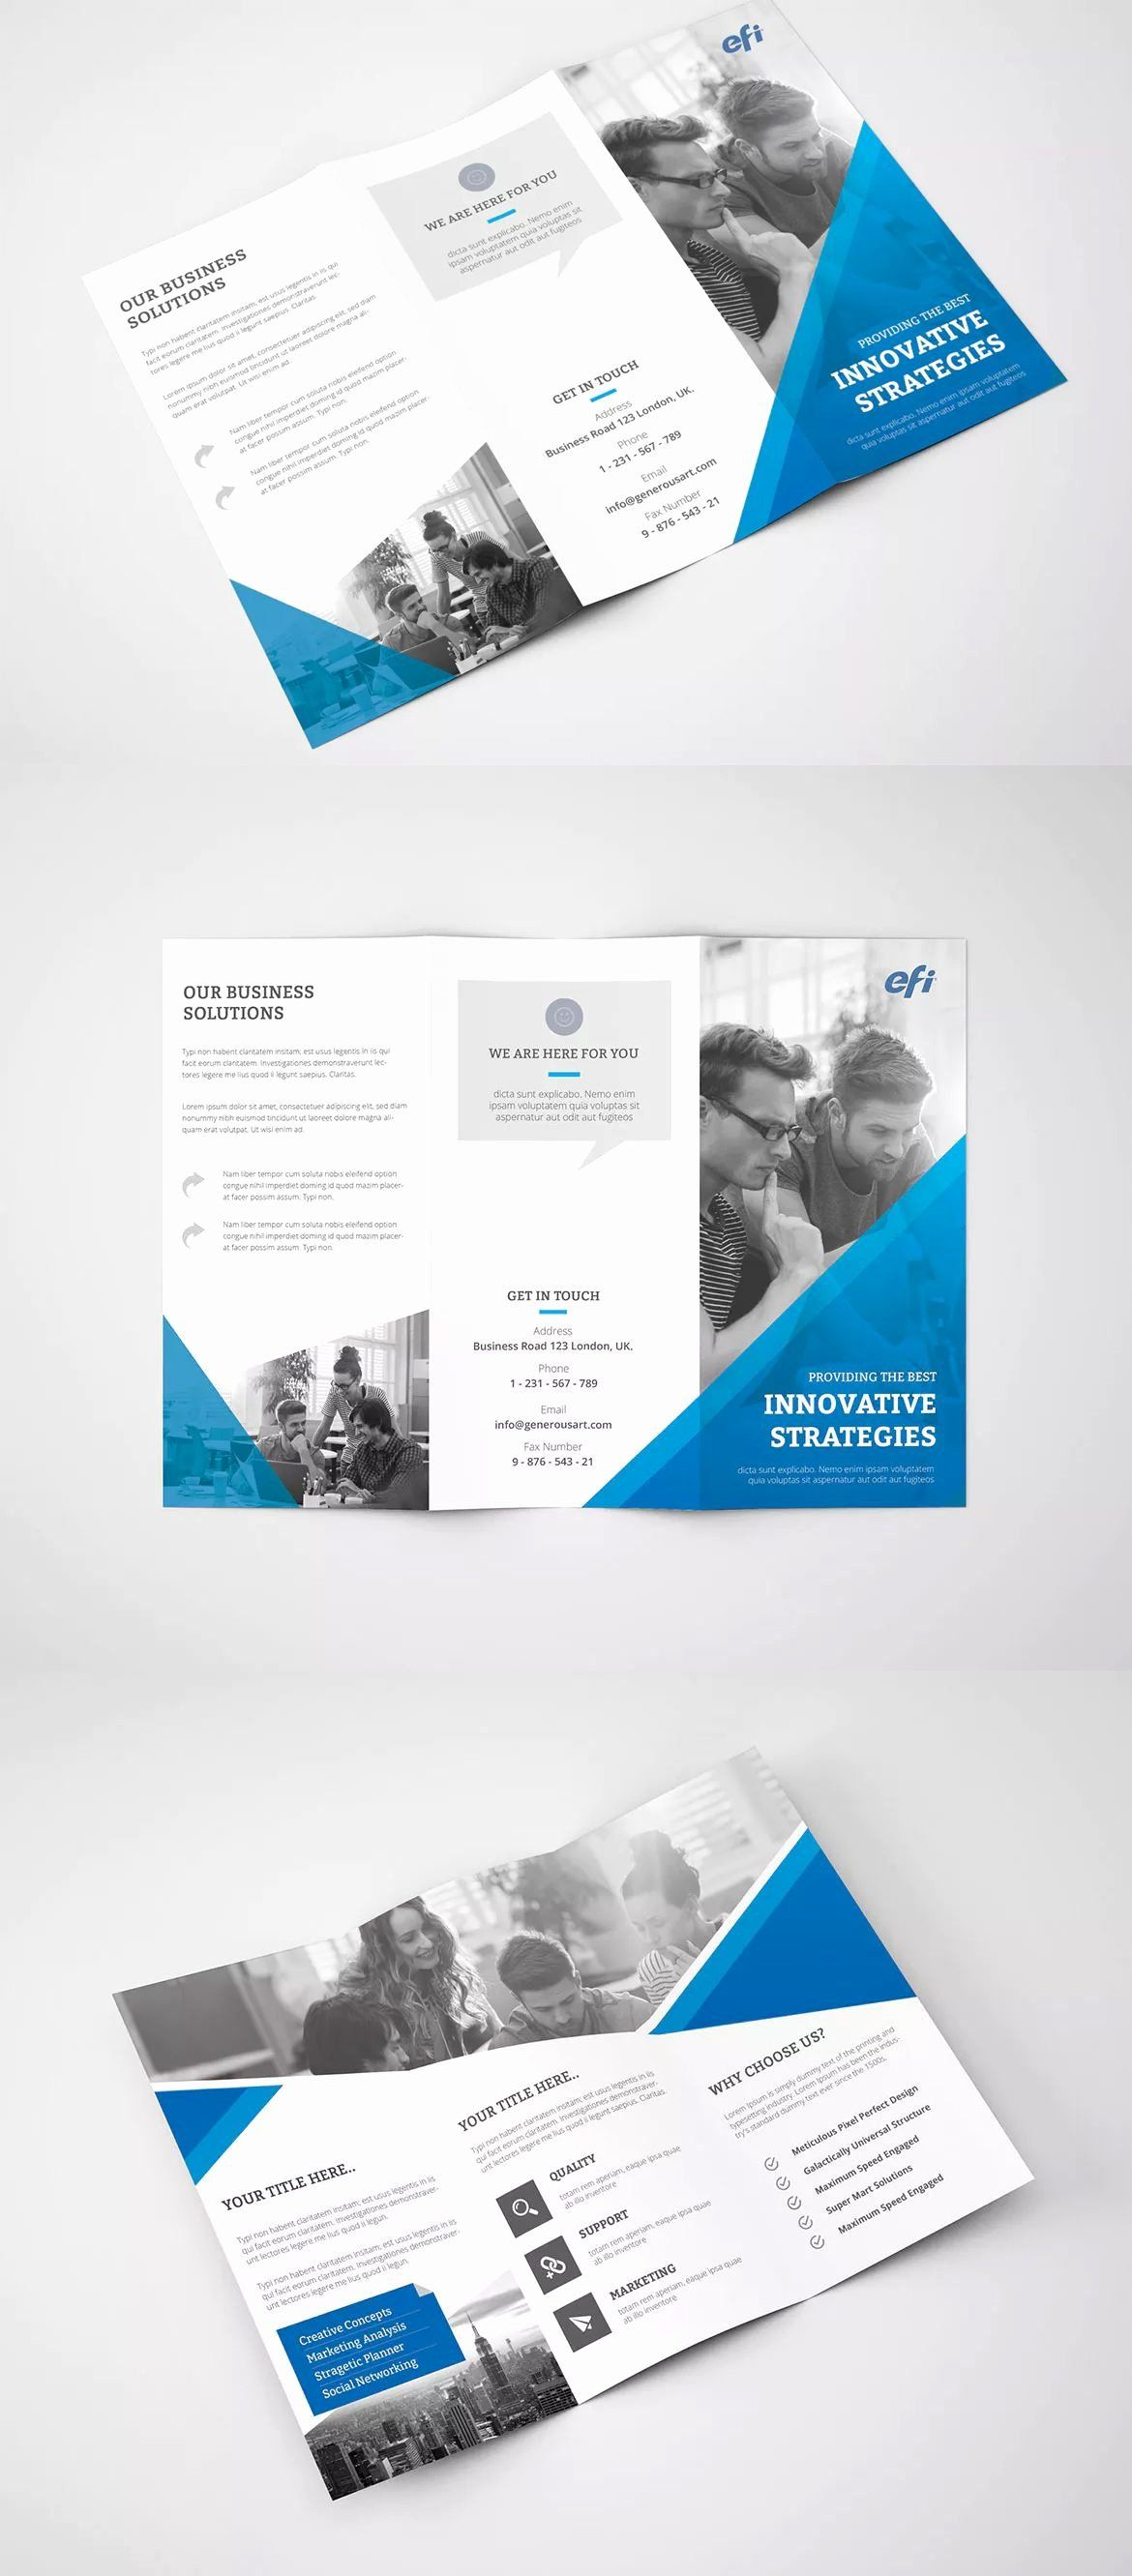 A4 Tri Fold Brochure Template New Free Printable Tri Fold Pamphlet Template 1486 Brochure Design Template Trifold Brochure Design Trifold Brochure A4 tri fold brochure template